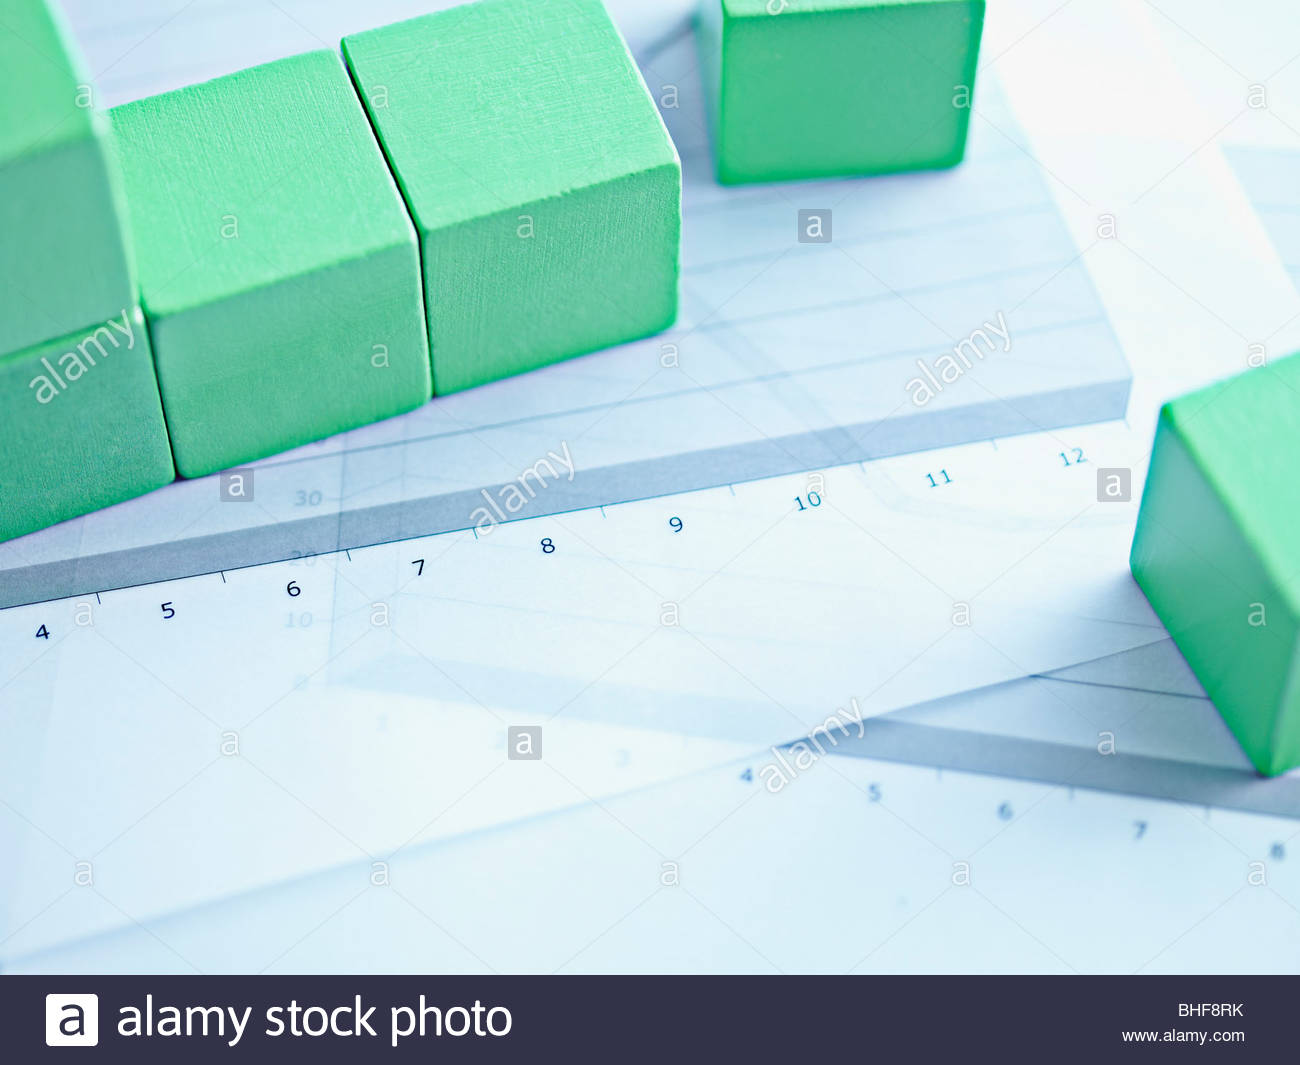 Blocks on paper charts - Stock Image